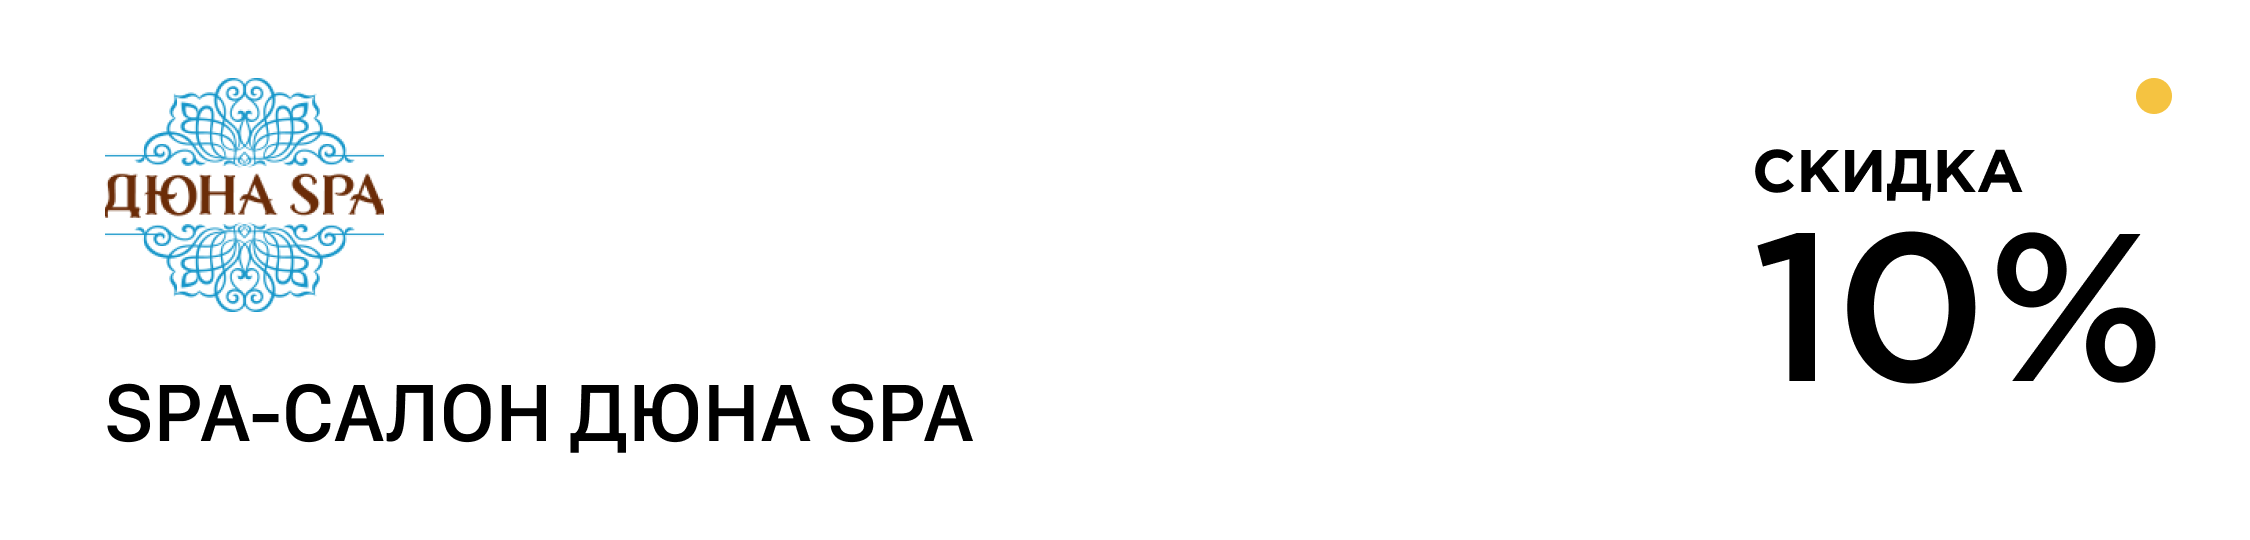 Дюна SPA